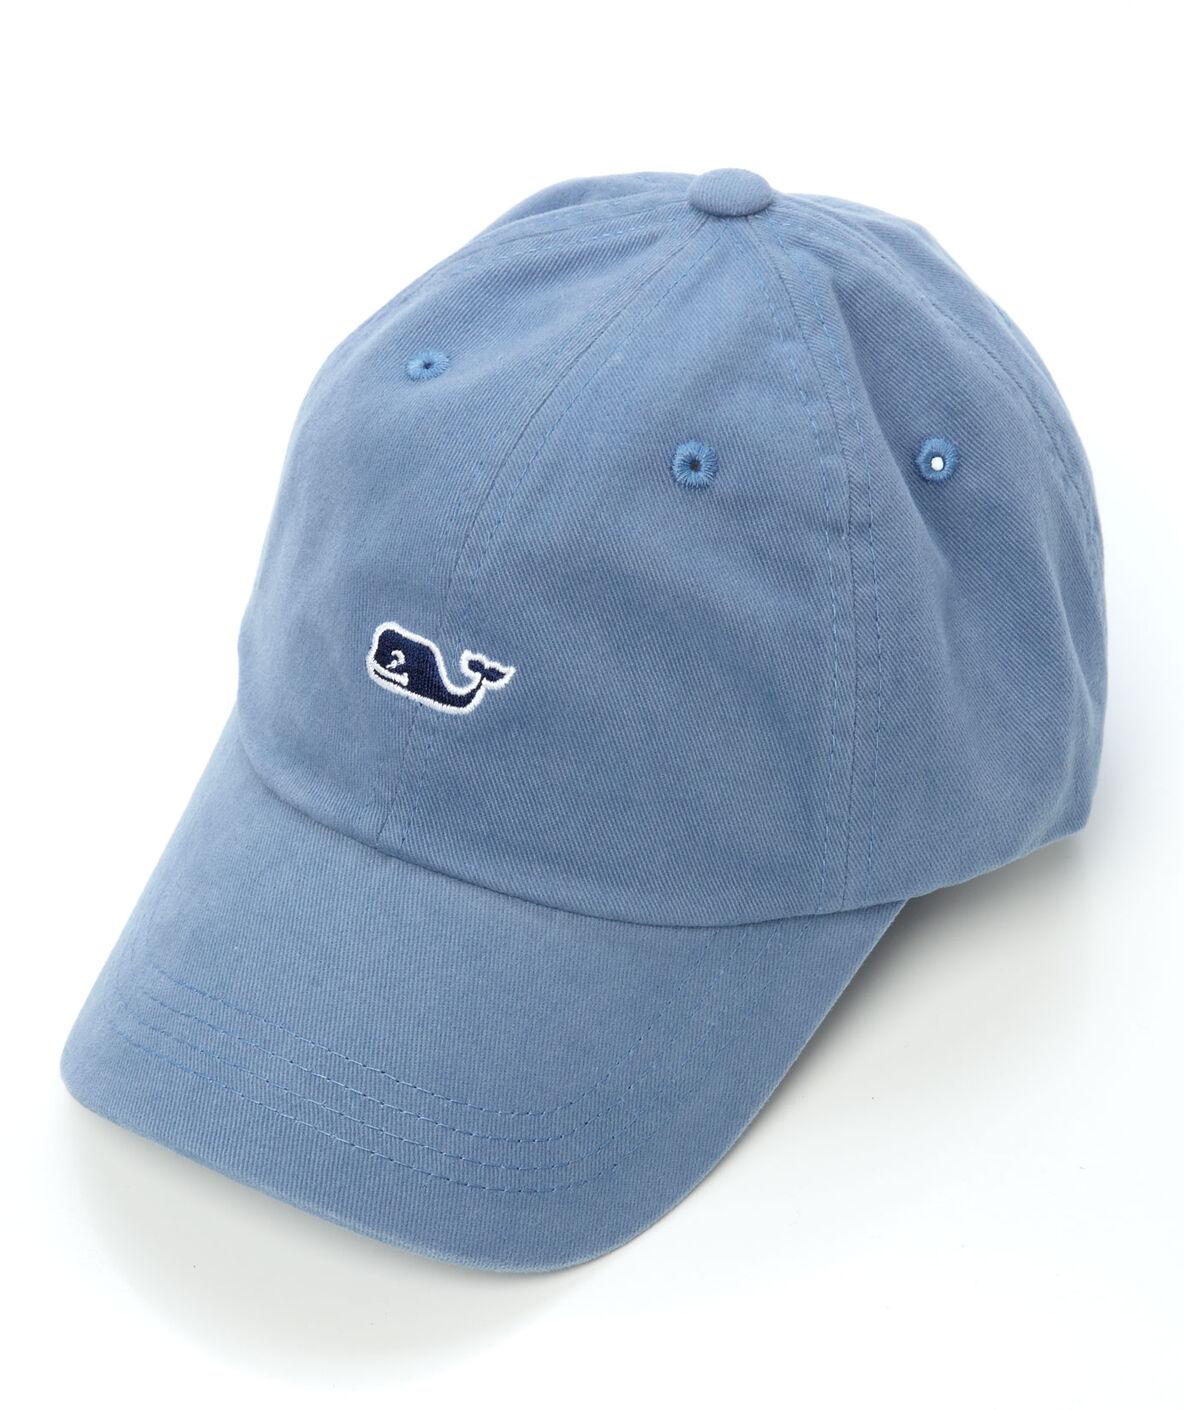 Shop Signature Whale Logo Baseball Hat At Vineyard Vines